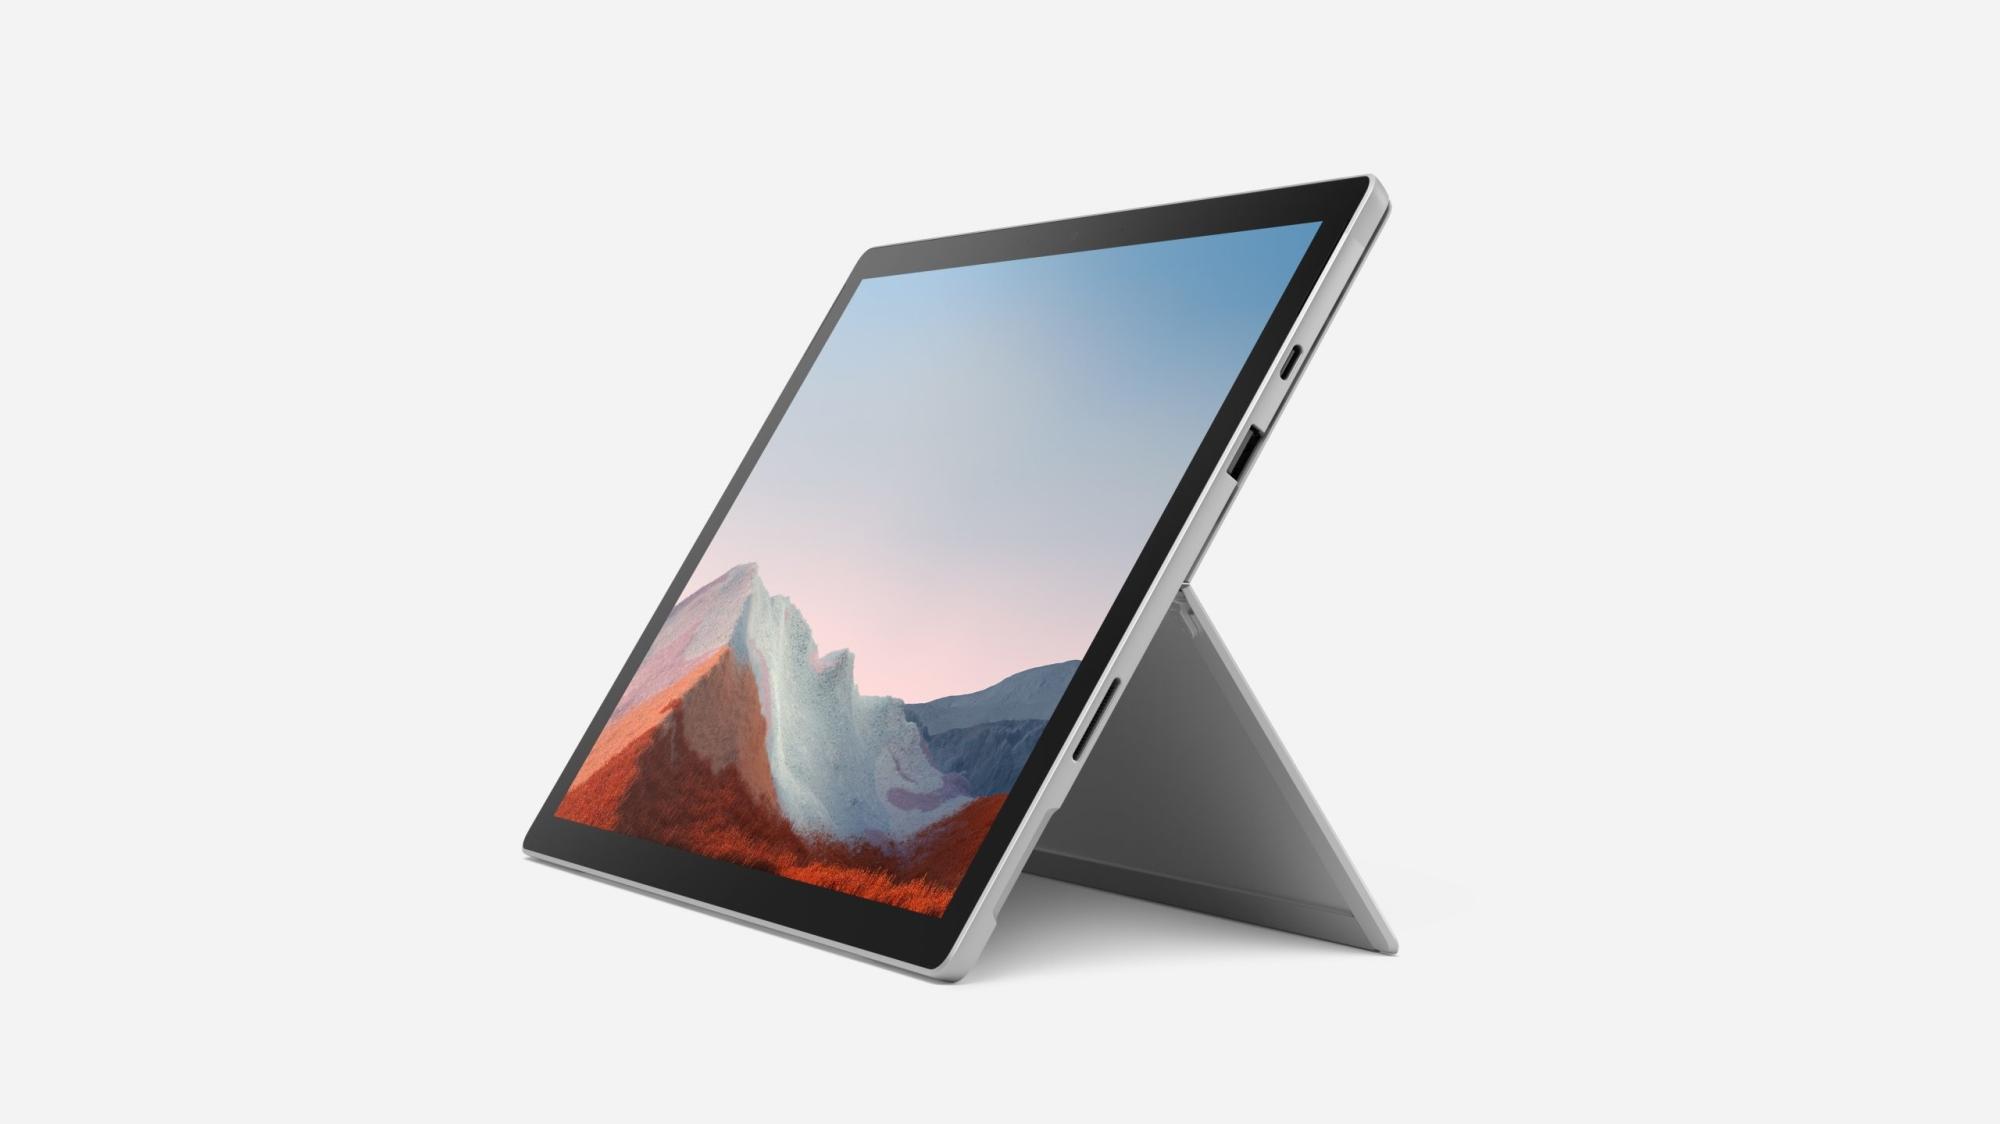 Surface Pro 7+ 256 Gb 31,2 Cm (12.3) Intel Core I7-11xxx 16 Gb Wi-fi 6 (802.11ax) Windows 10 Pro Platino